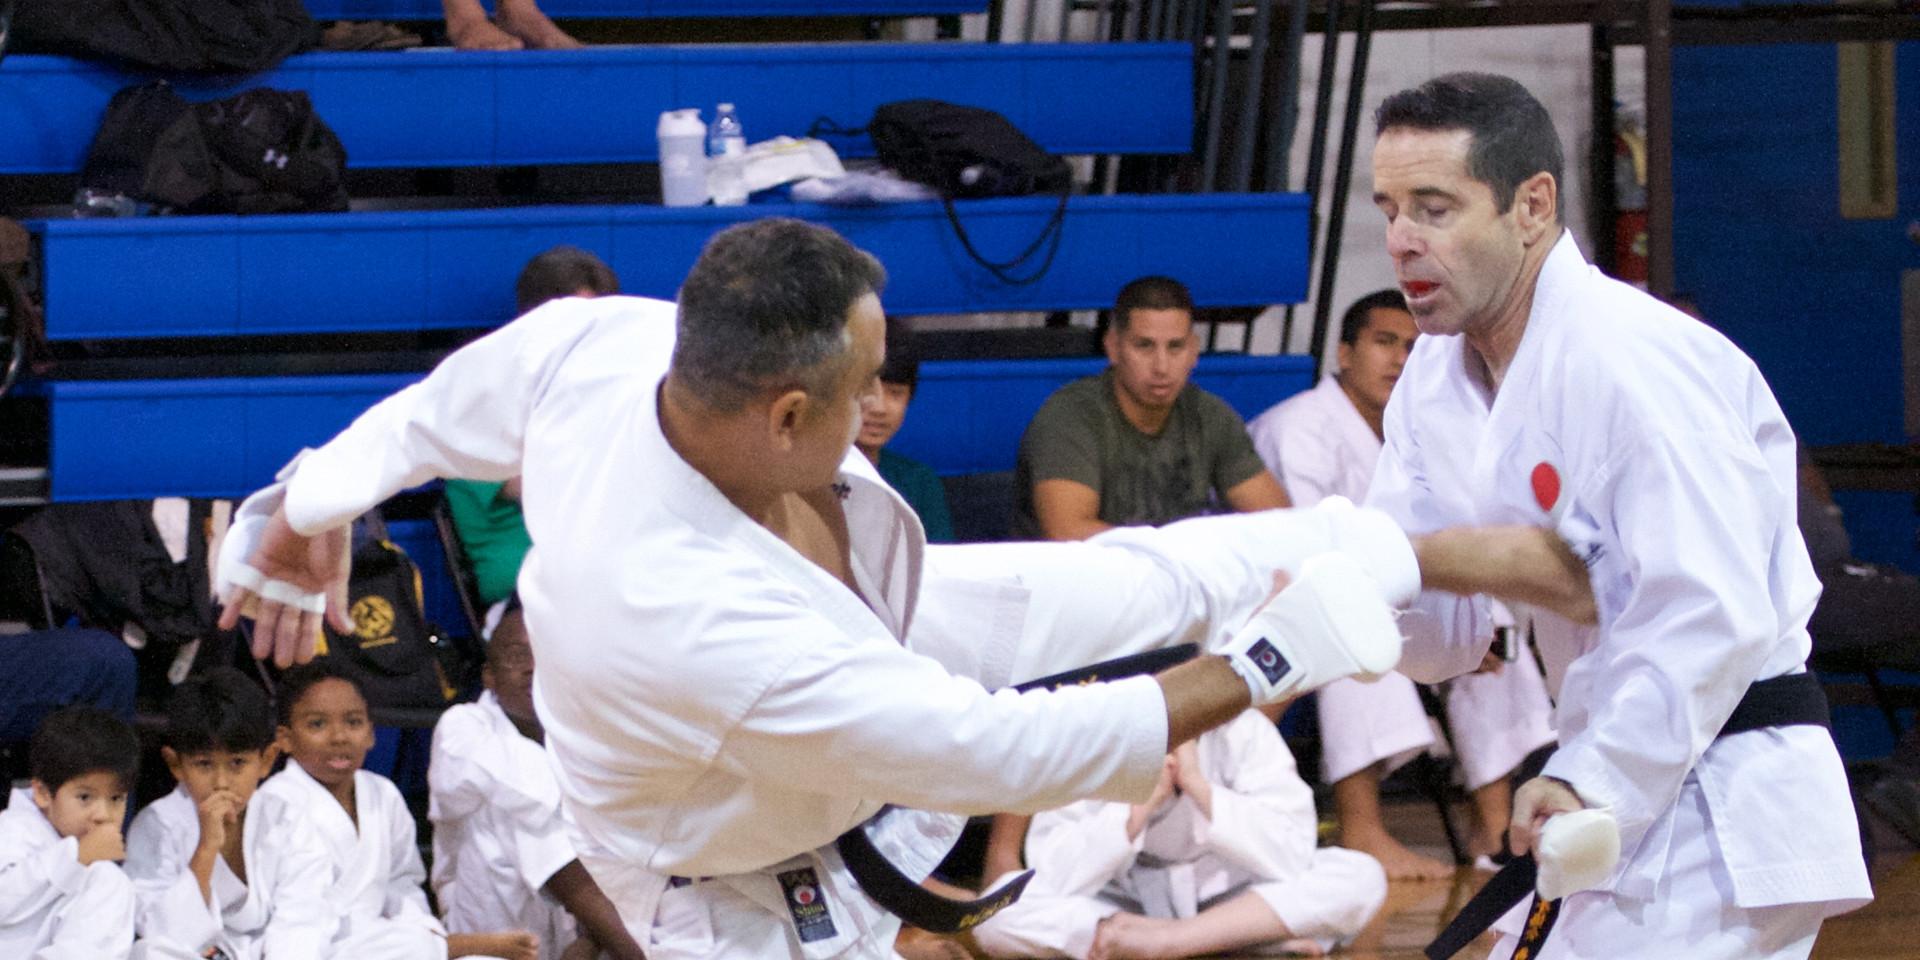 EPride_KaratePics-104.jpg